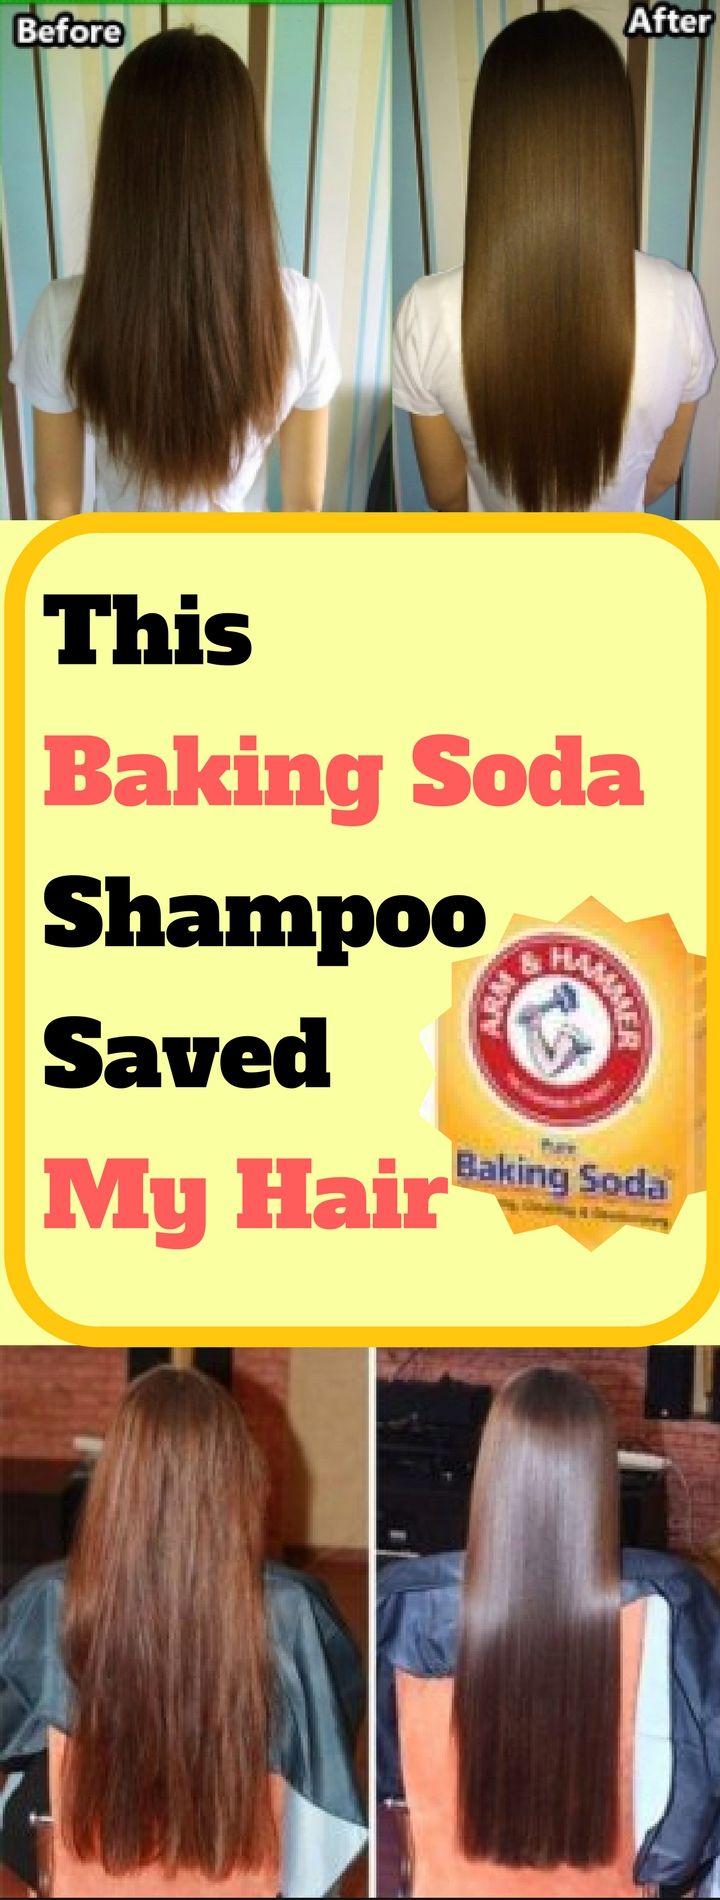 This Baking Soda Shampoo Saved My Hair Baking Soda Shampoo Recipe Baking Soda Shampoo Grow Hair